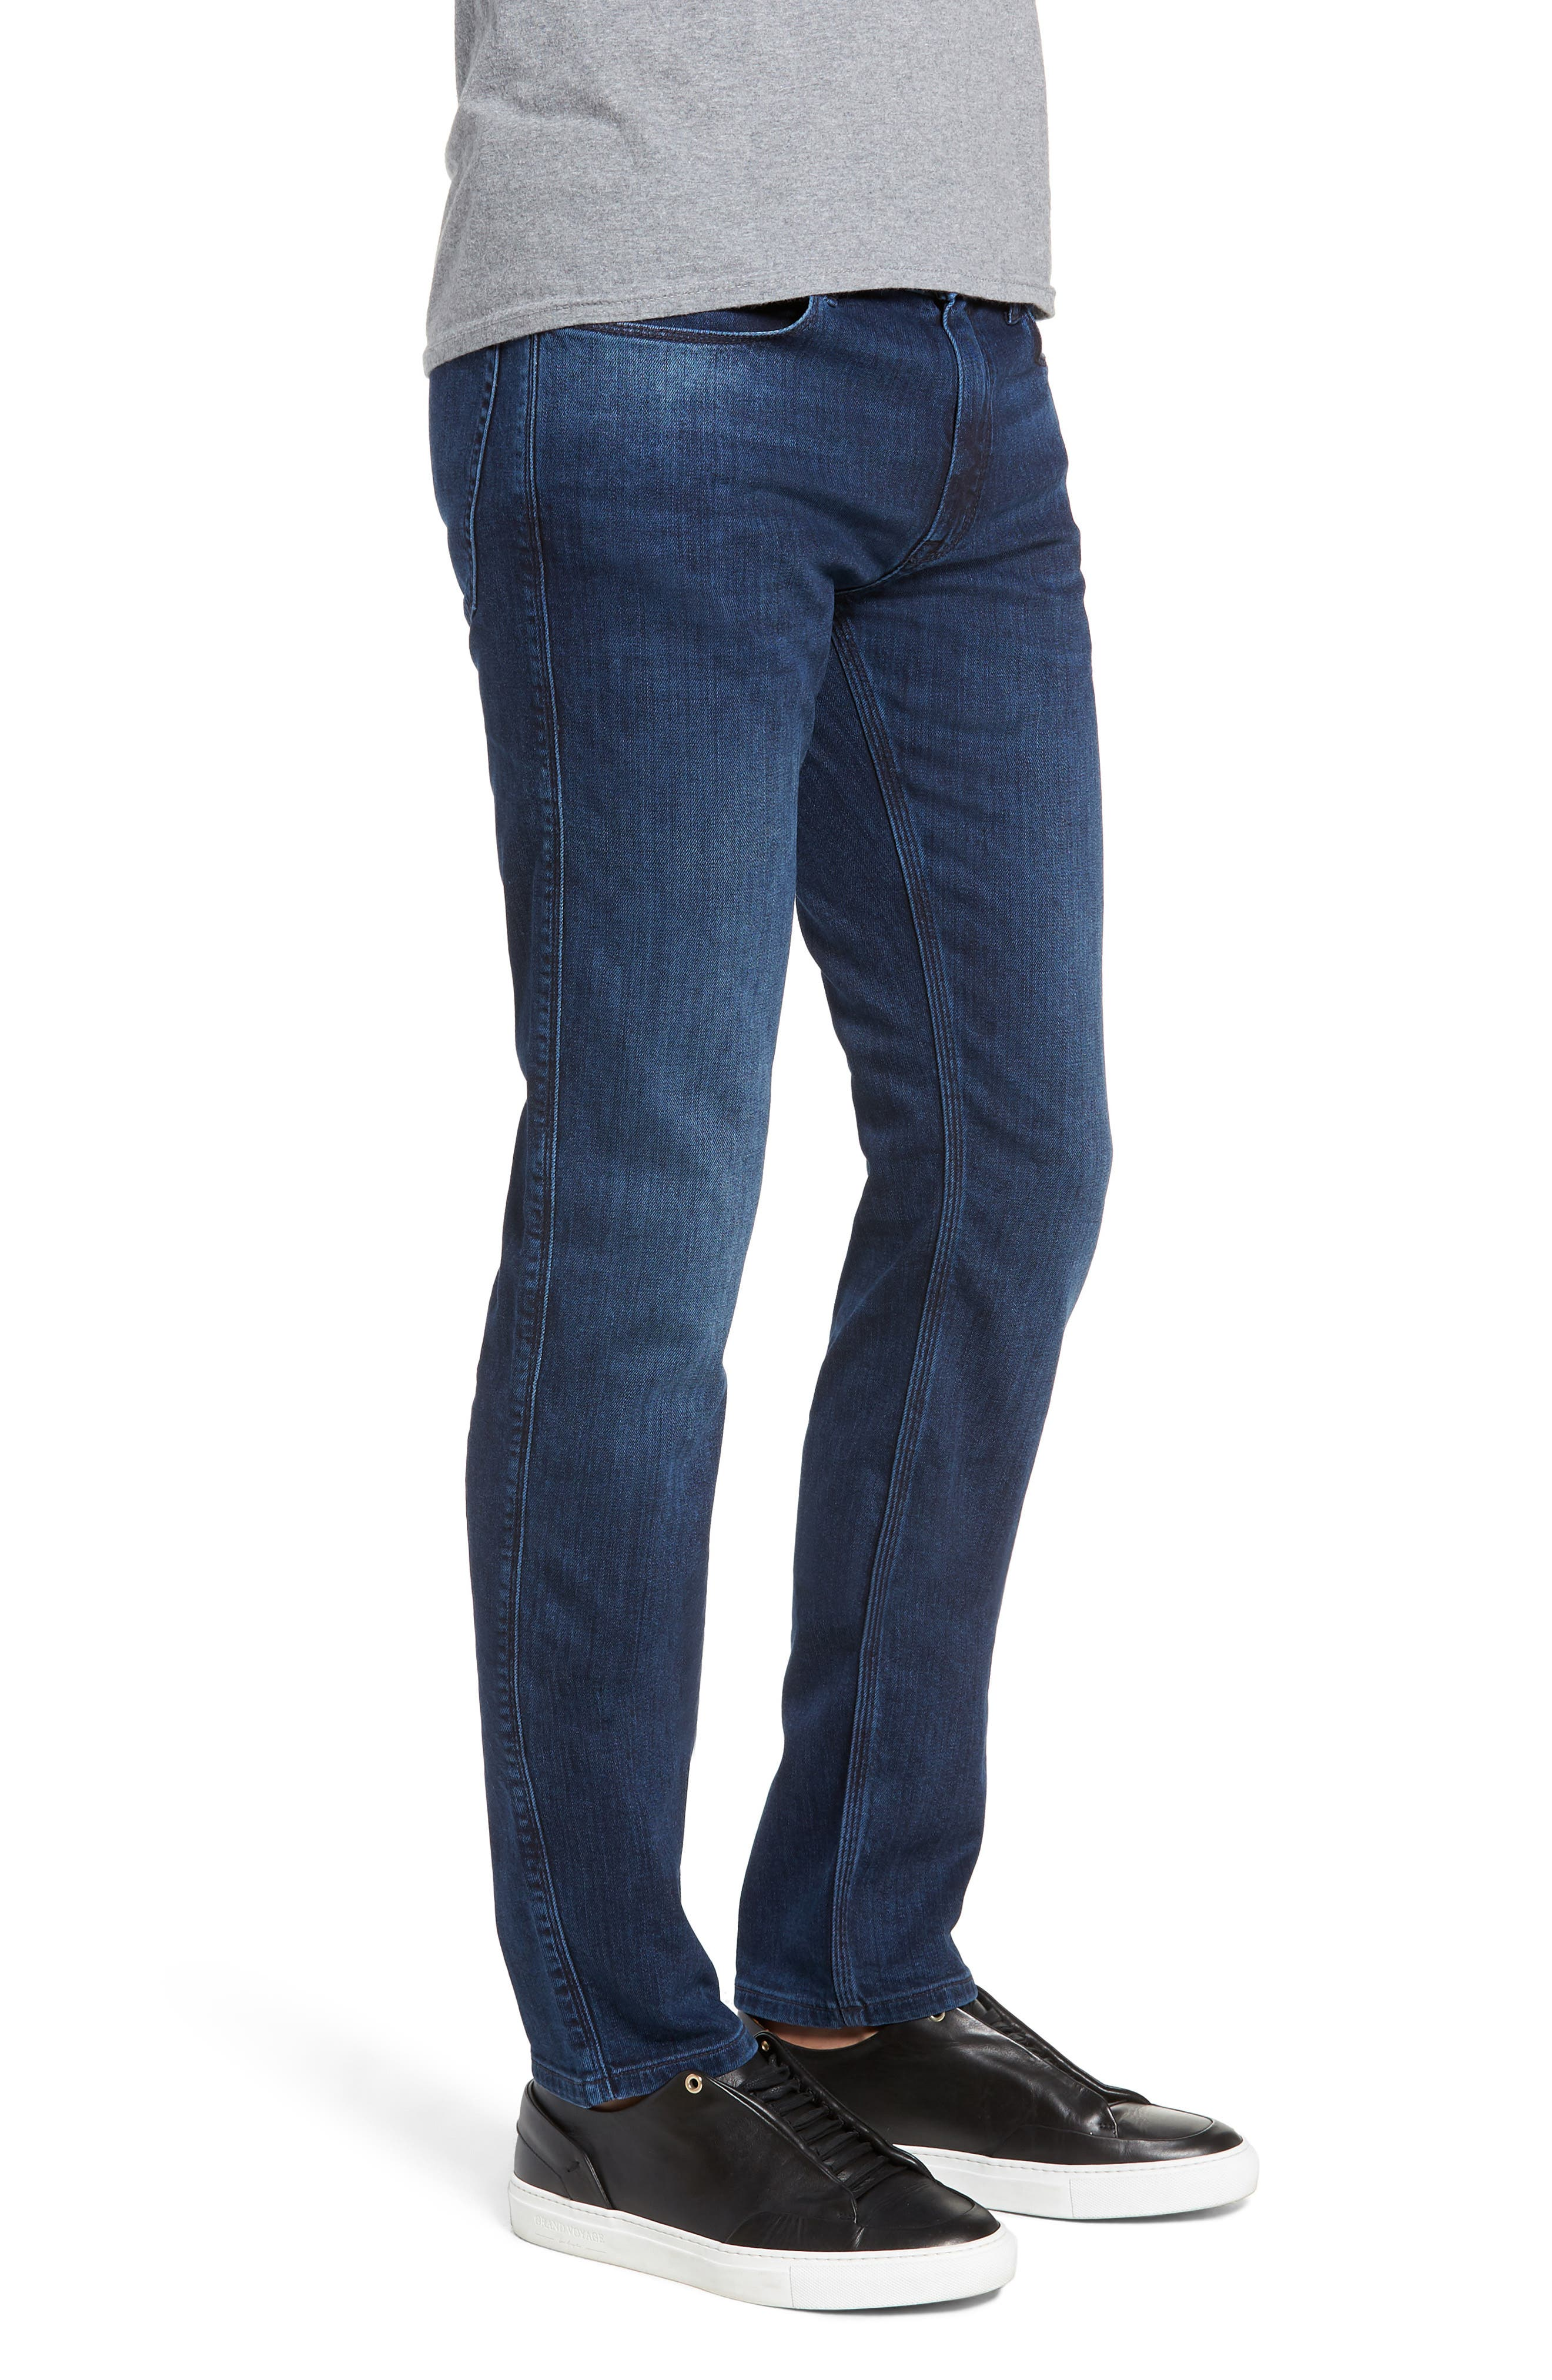 708 Stretch Slim Fit Jeans,                             Alternate thumbnail 3, color,                             420